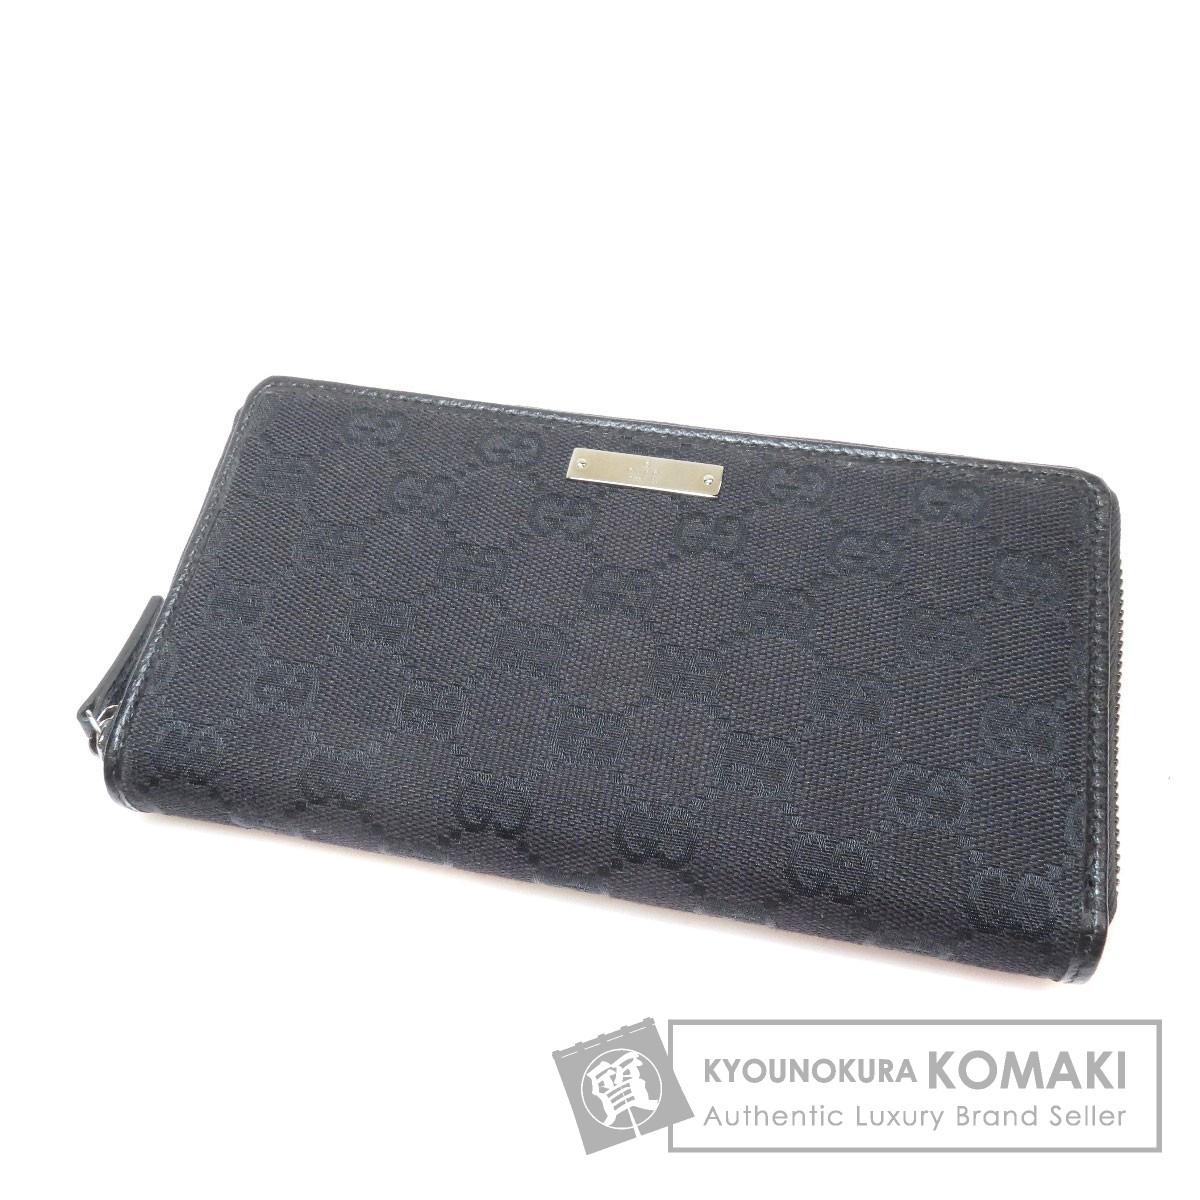 fb32751989d80d Kyonokura Komaki Brand Cheapest Challenger: Authentic GUCCI 307980 ...